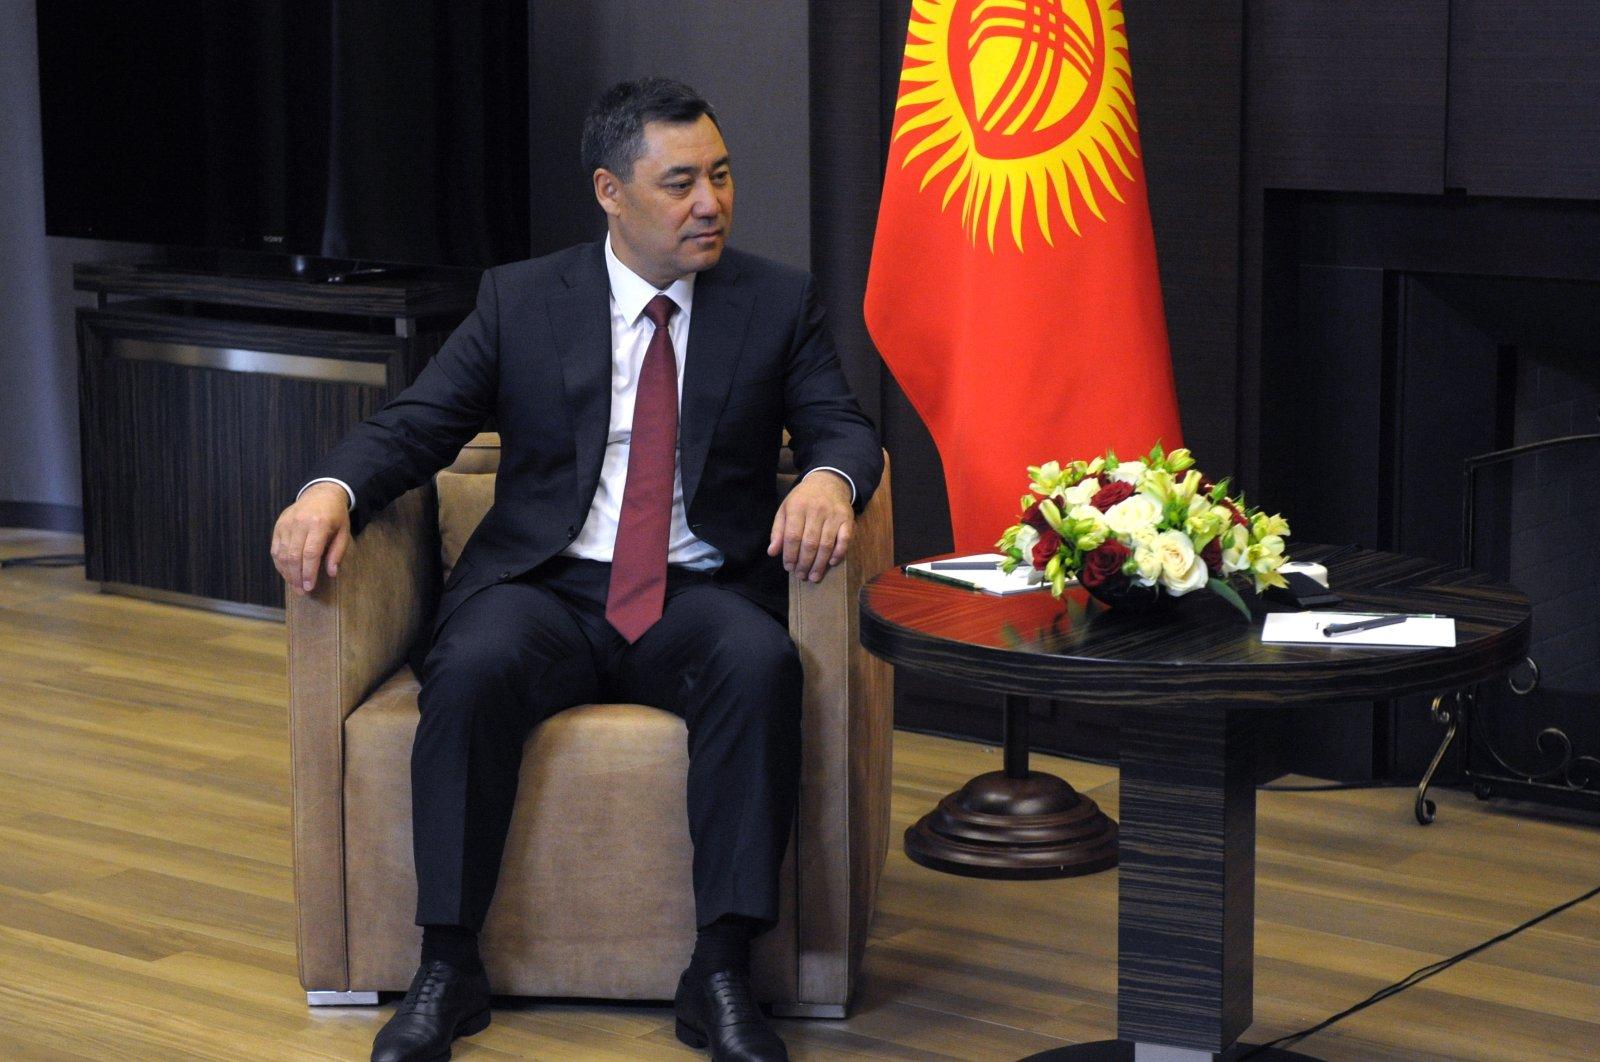 Kyrgyz President Sadyr Japarov attends a meeting with Russian President Vladimir Putin in Sochi, Russia, May 24, 2021.  (EPA Photo)